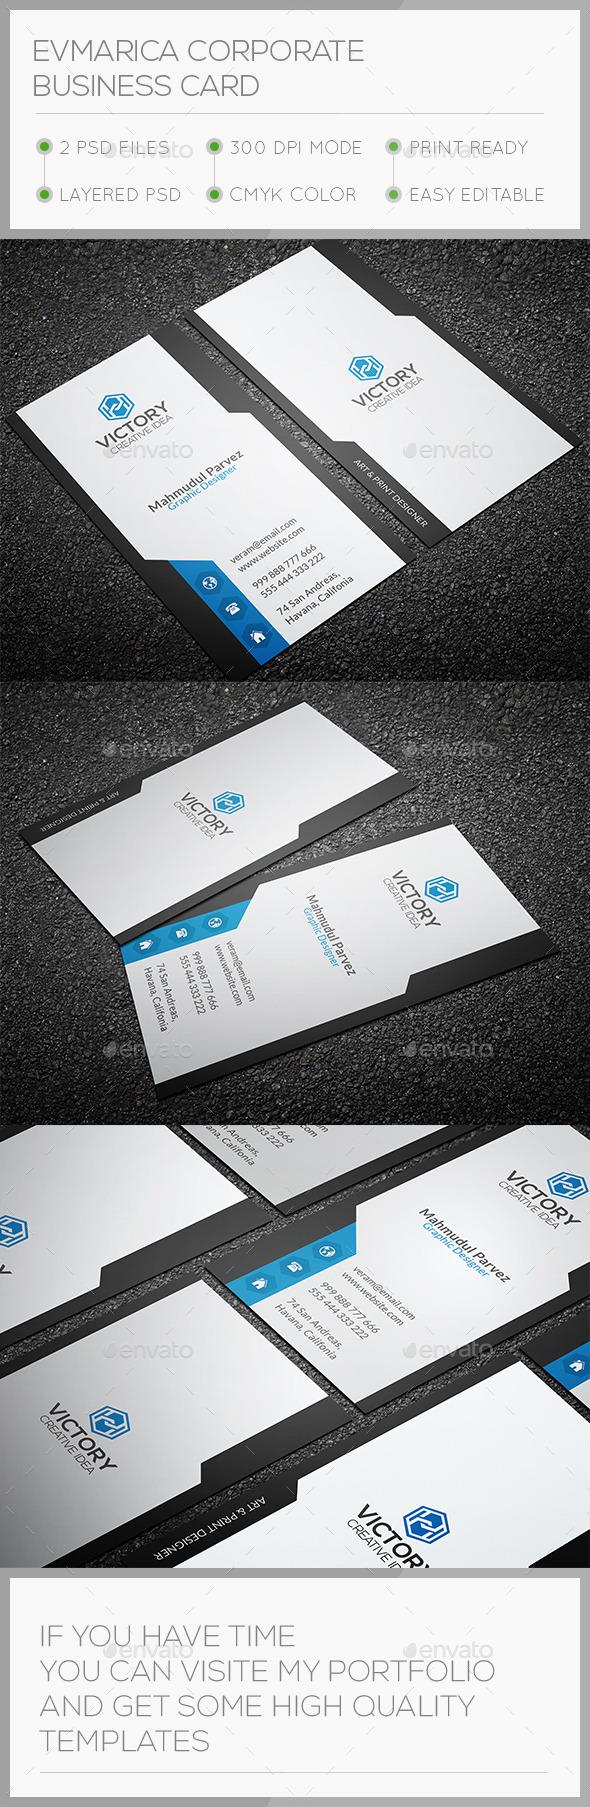 GraphicRiver Evmarica Corporate Business Card 10722436